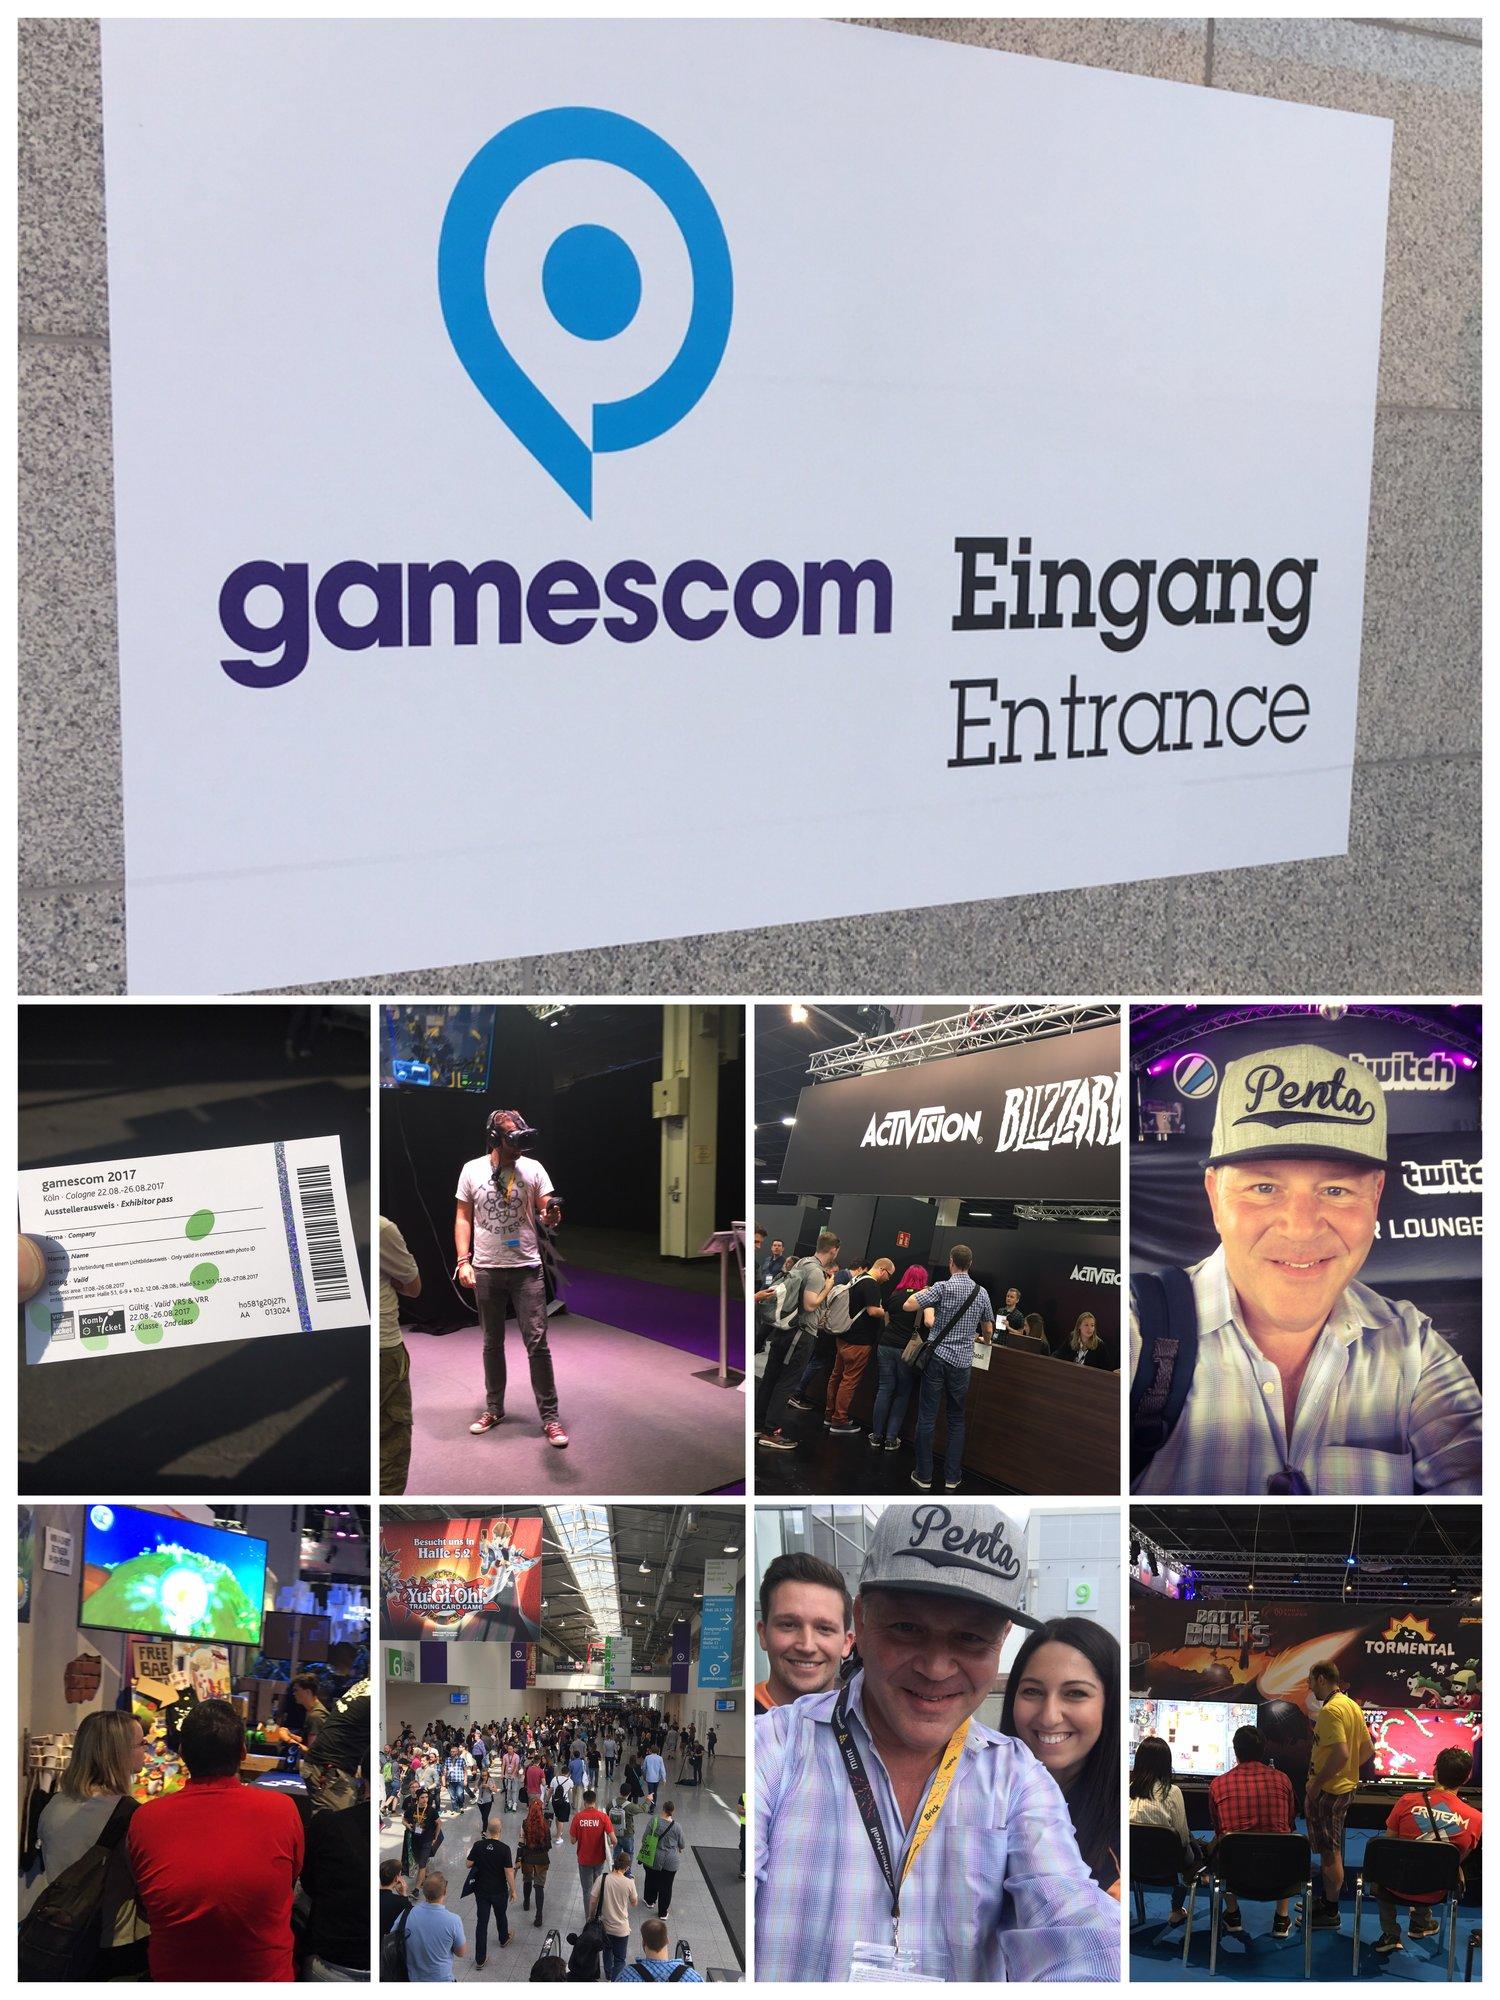 Recap Of Gamescom 2017 Cologne Germany Stephen A Crystal Esq